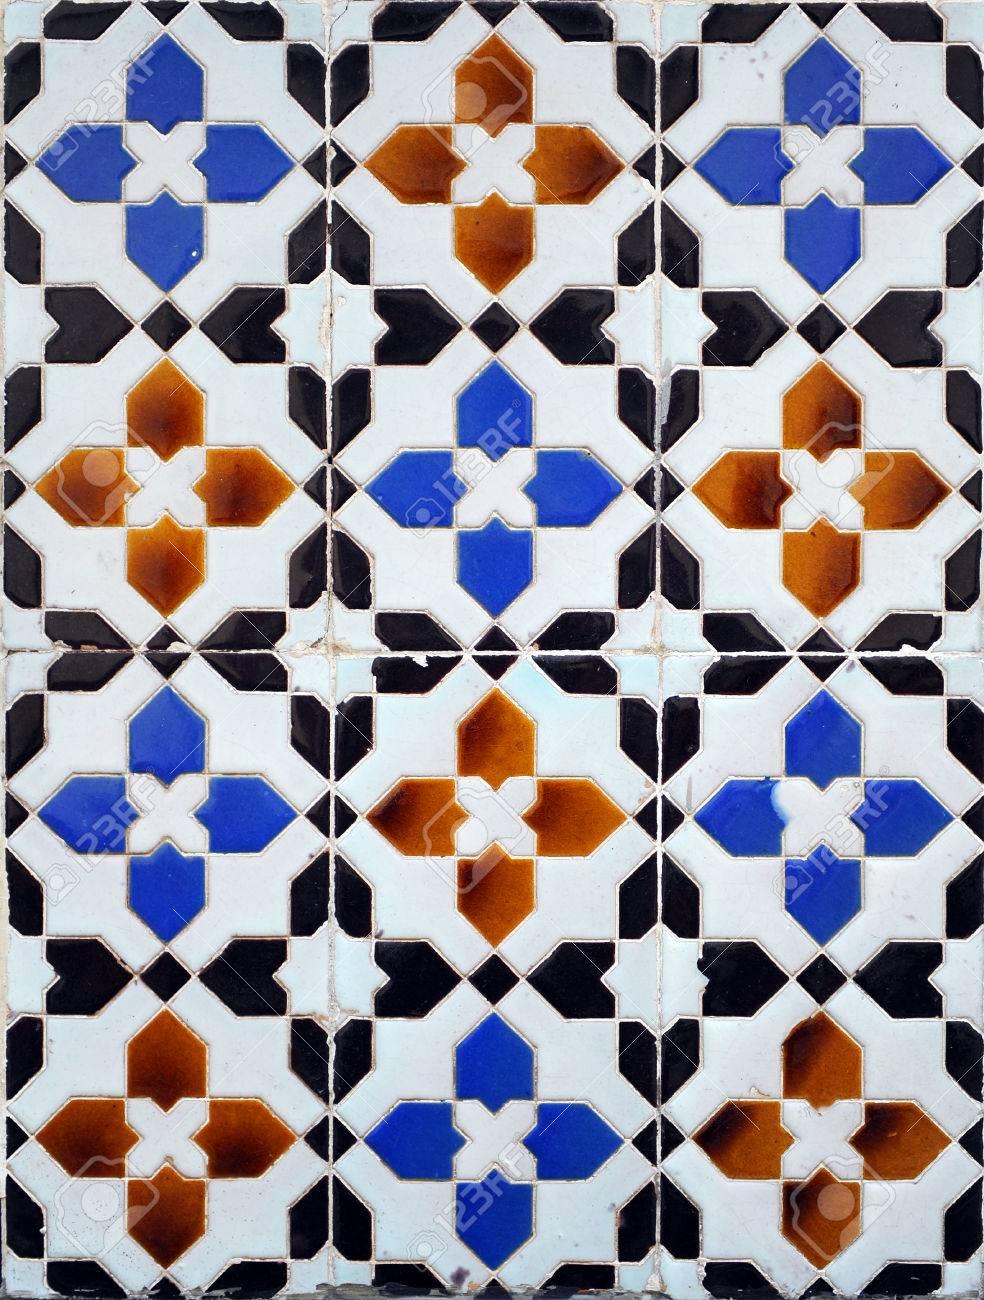 Ceramica Con Dibujos Geometricos De La Arquitectura Tradicional - Azulejos-con-dibujos